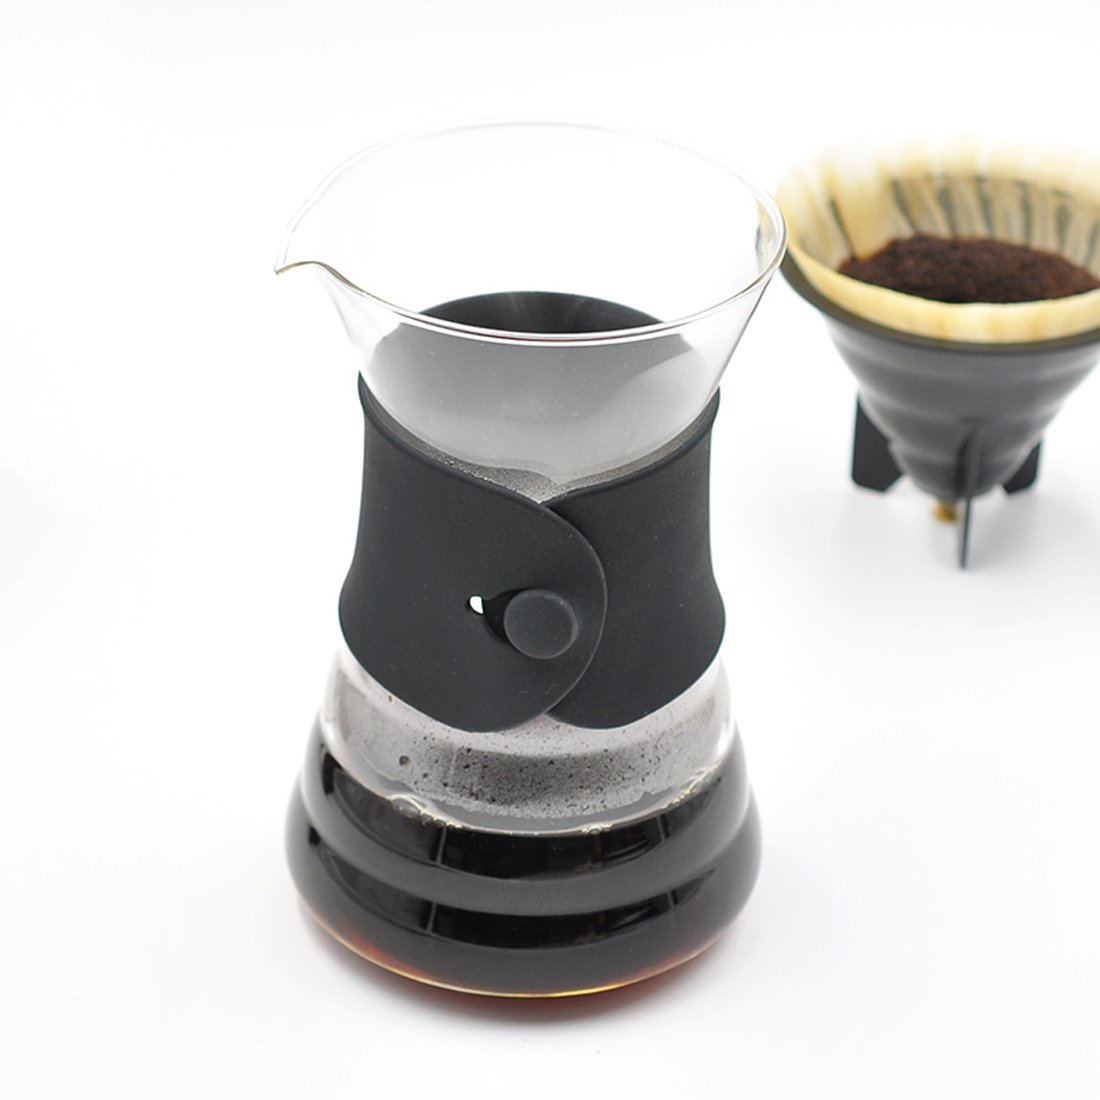 Hario V60 Drip Decanter japan import